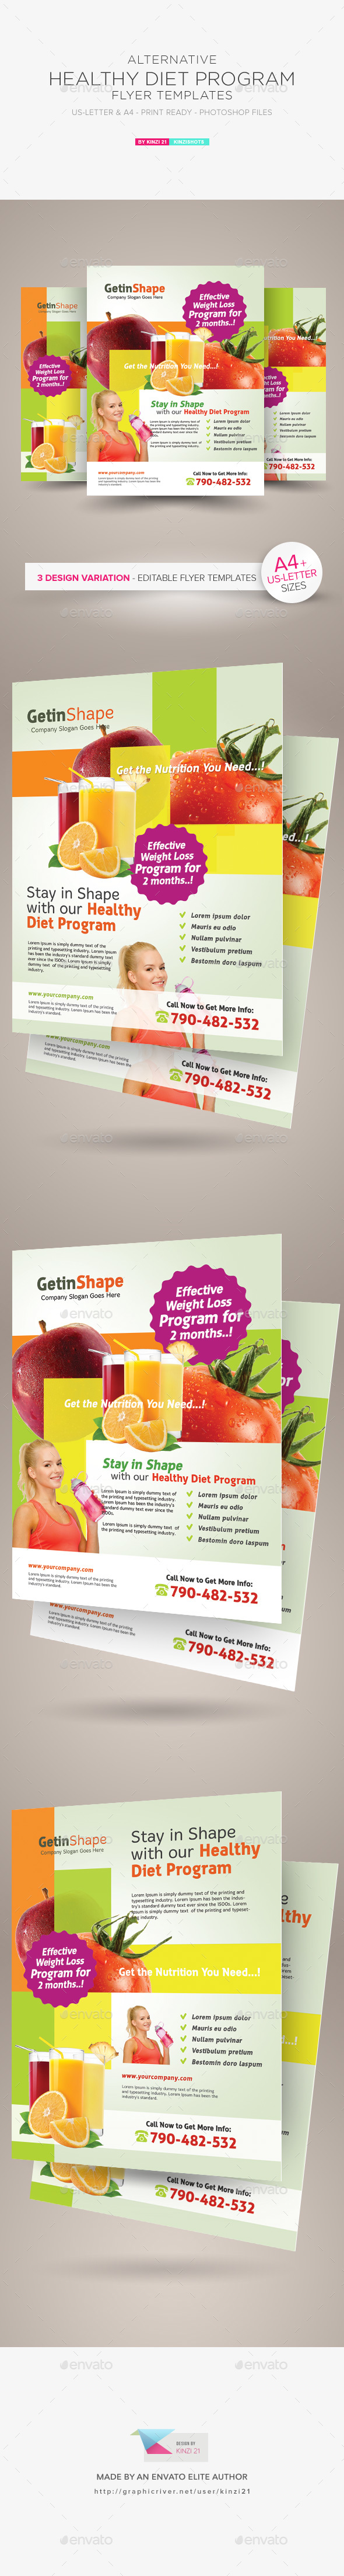 Healthy Diet Program Flyers - Corporate Flyers